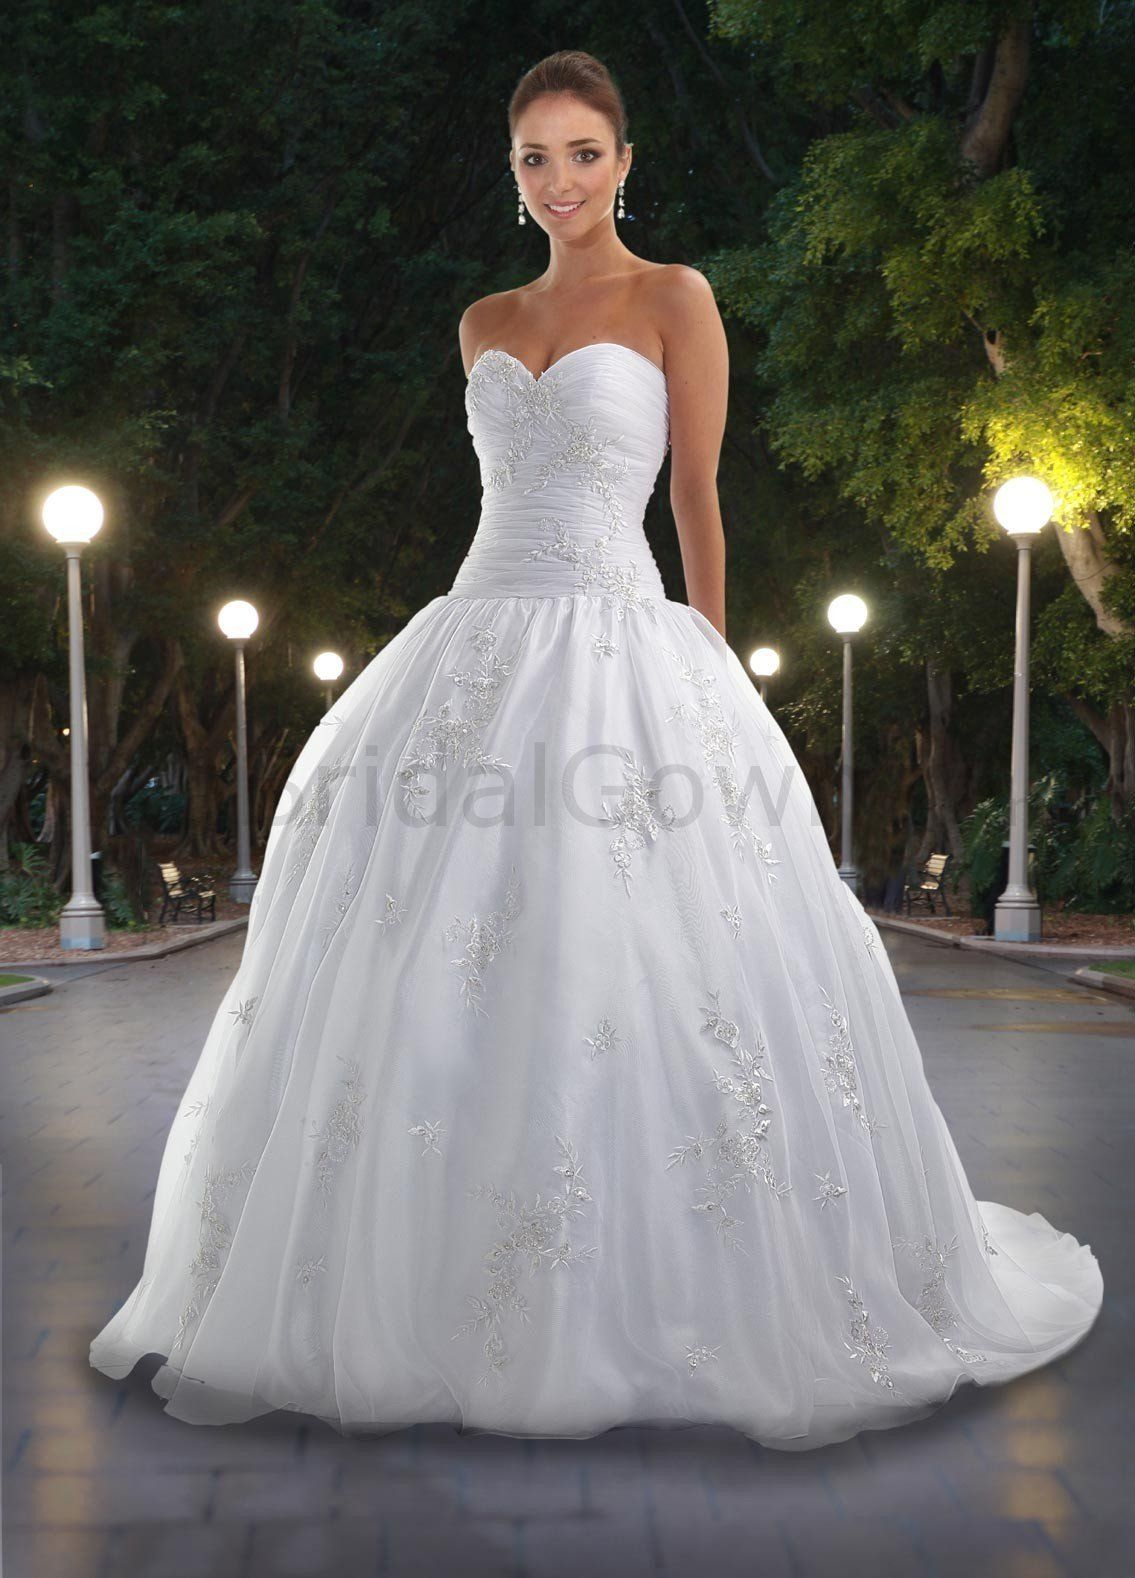 Sweetheart strapless wedding dress  wedding dresses sweetheart neckline  Google Search  Wedding Dress